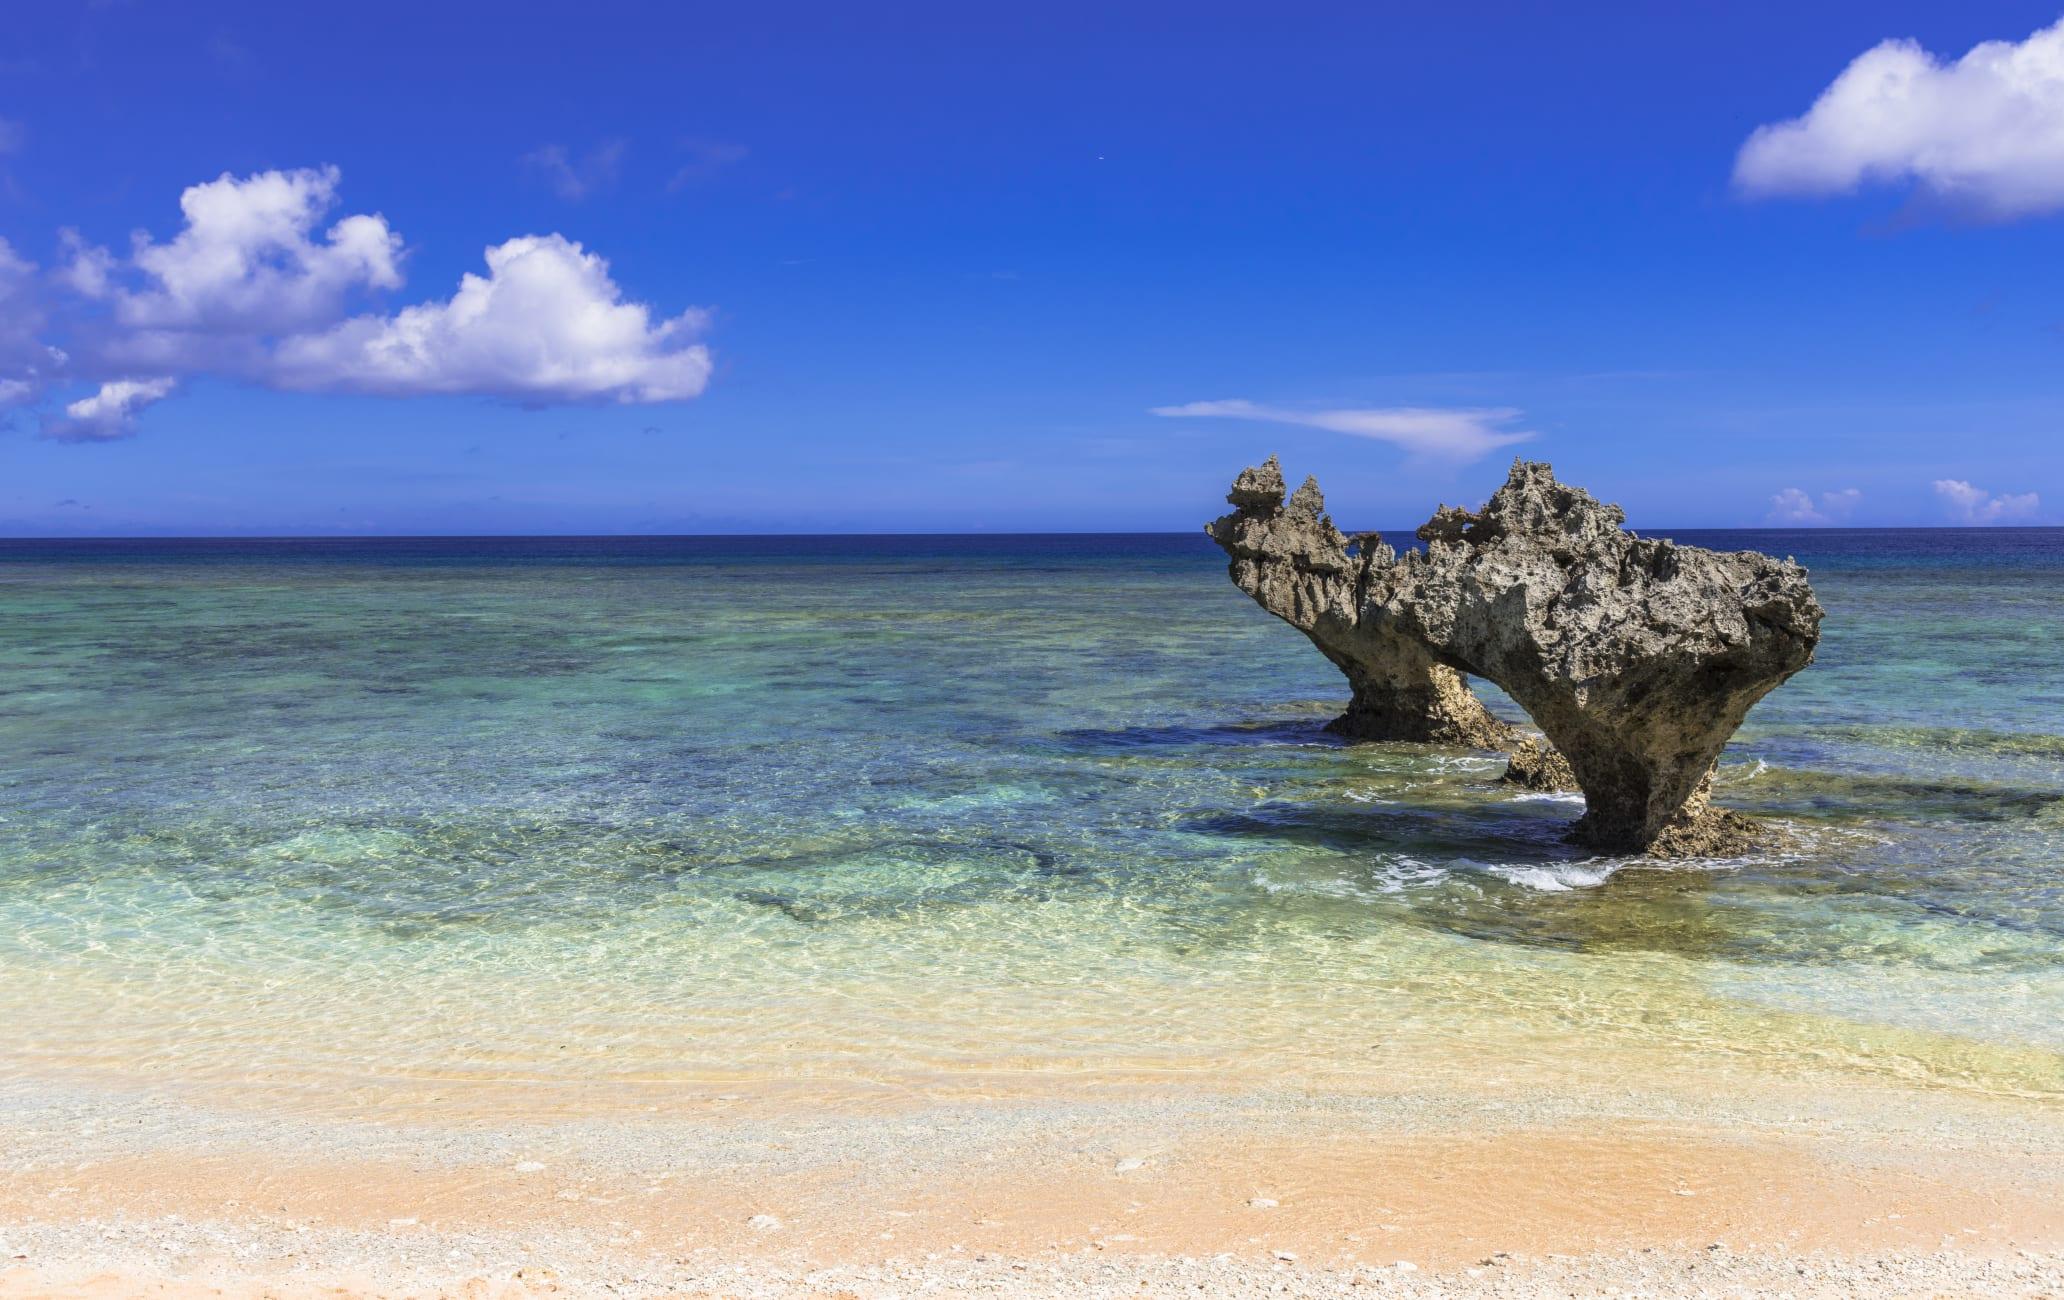 Kouri Island Bridge and Heart Rock